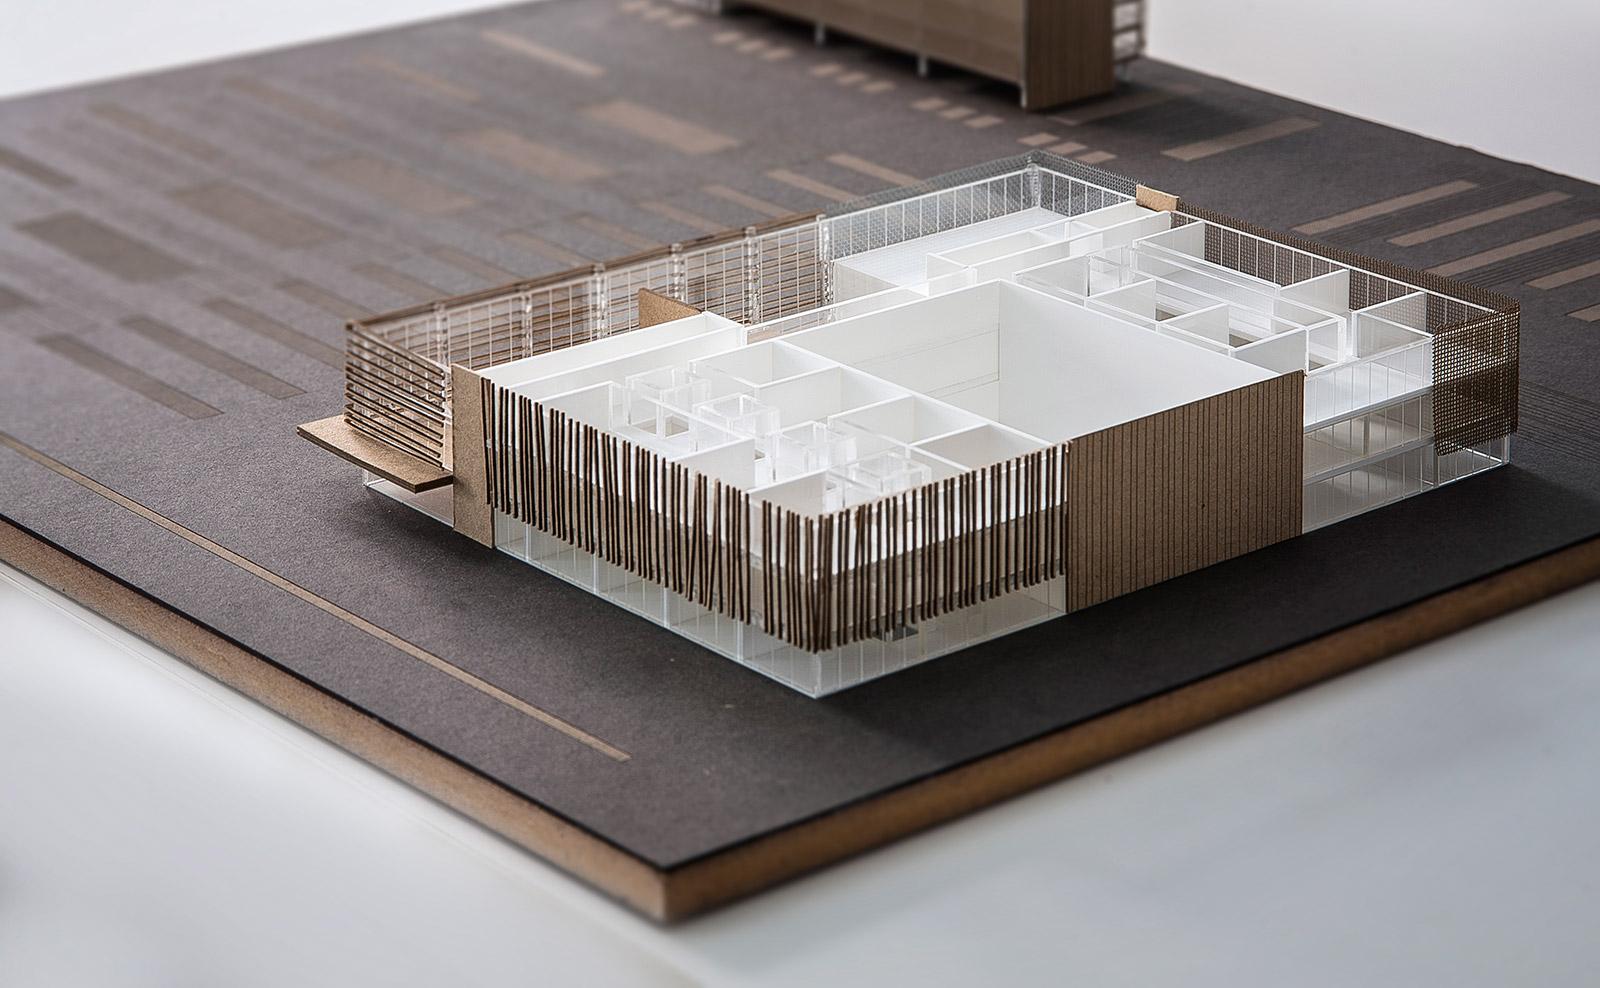 maqueta-arquitectura-architecture-model-tfg-etsav-upv-centro-de-produccion-musical-arquimaqueta-valencia-3